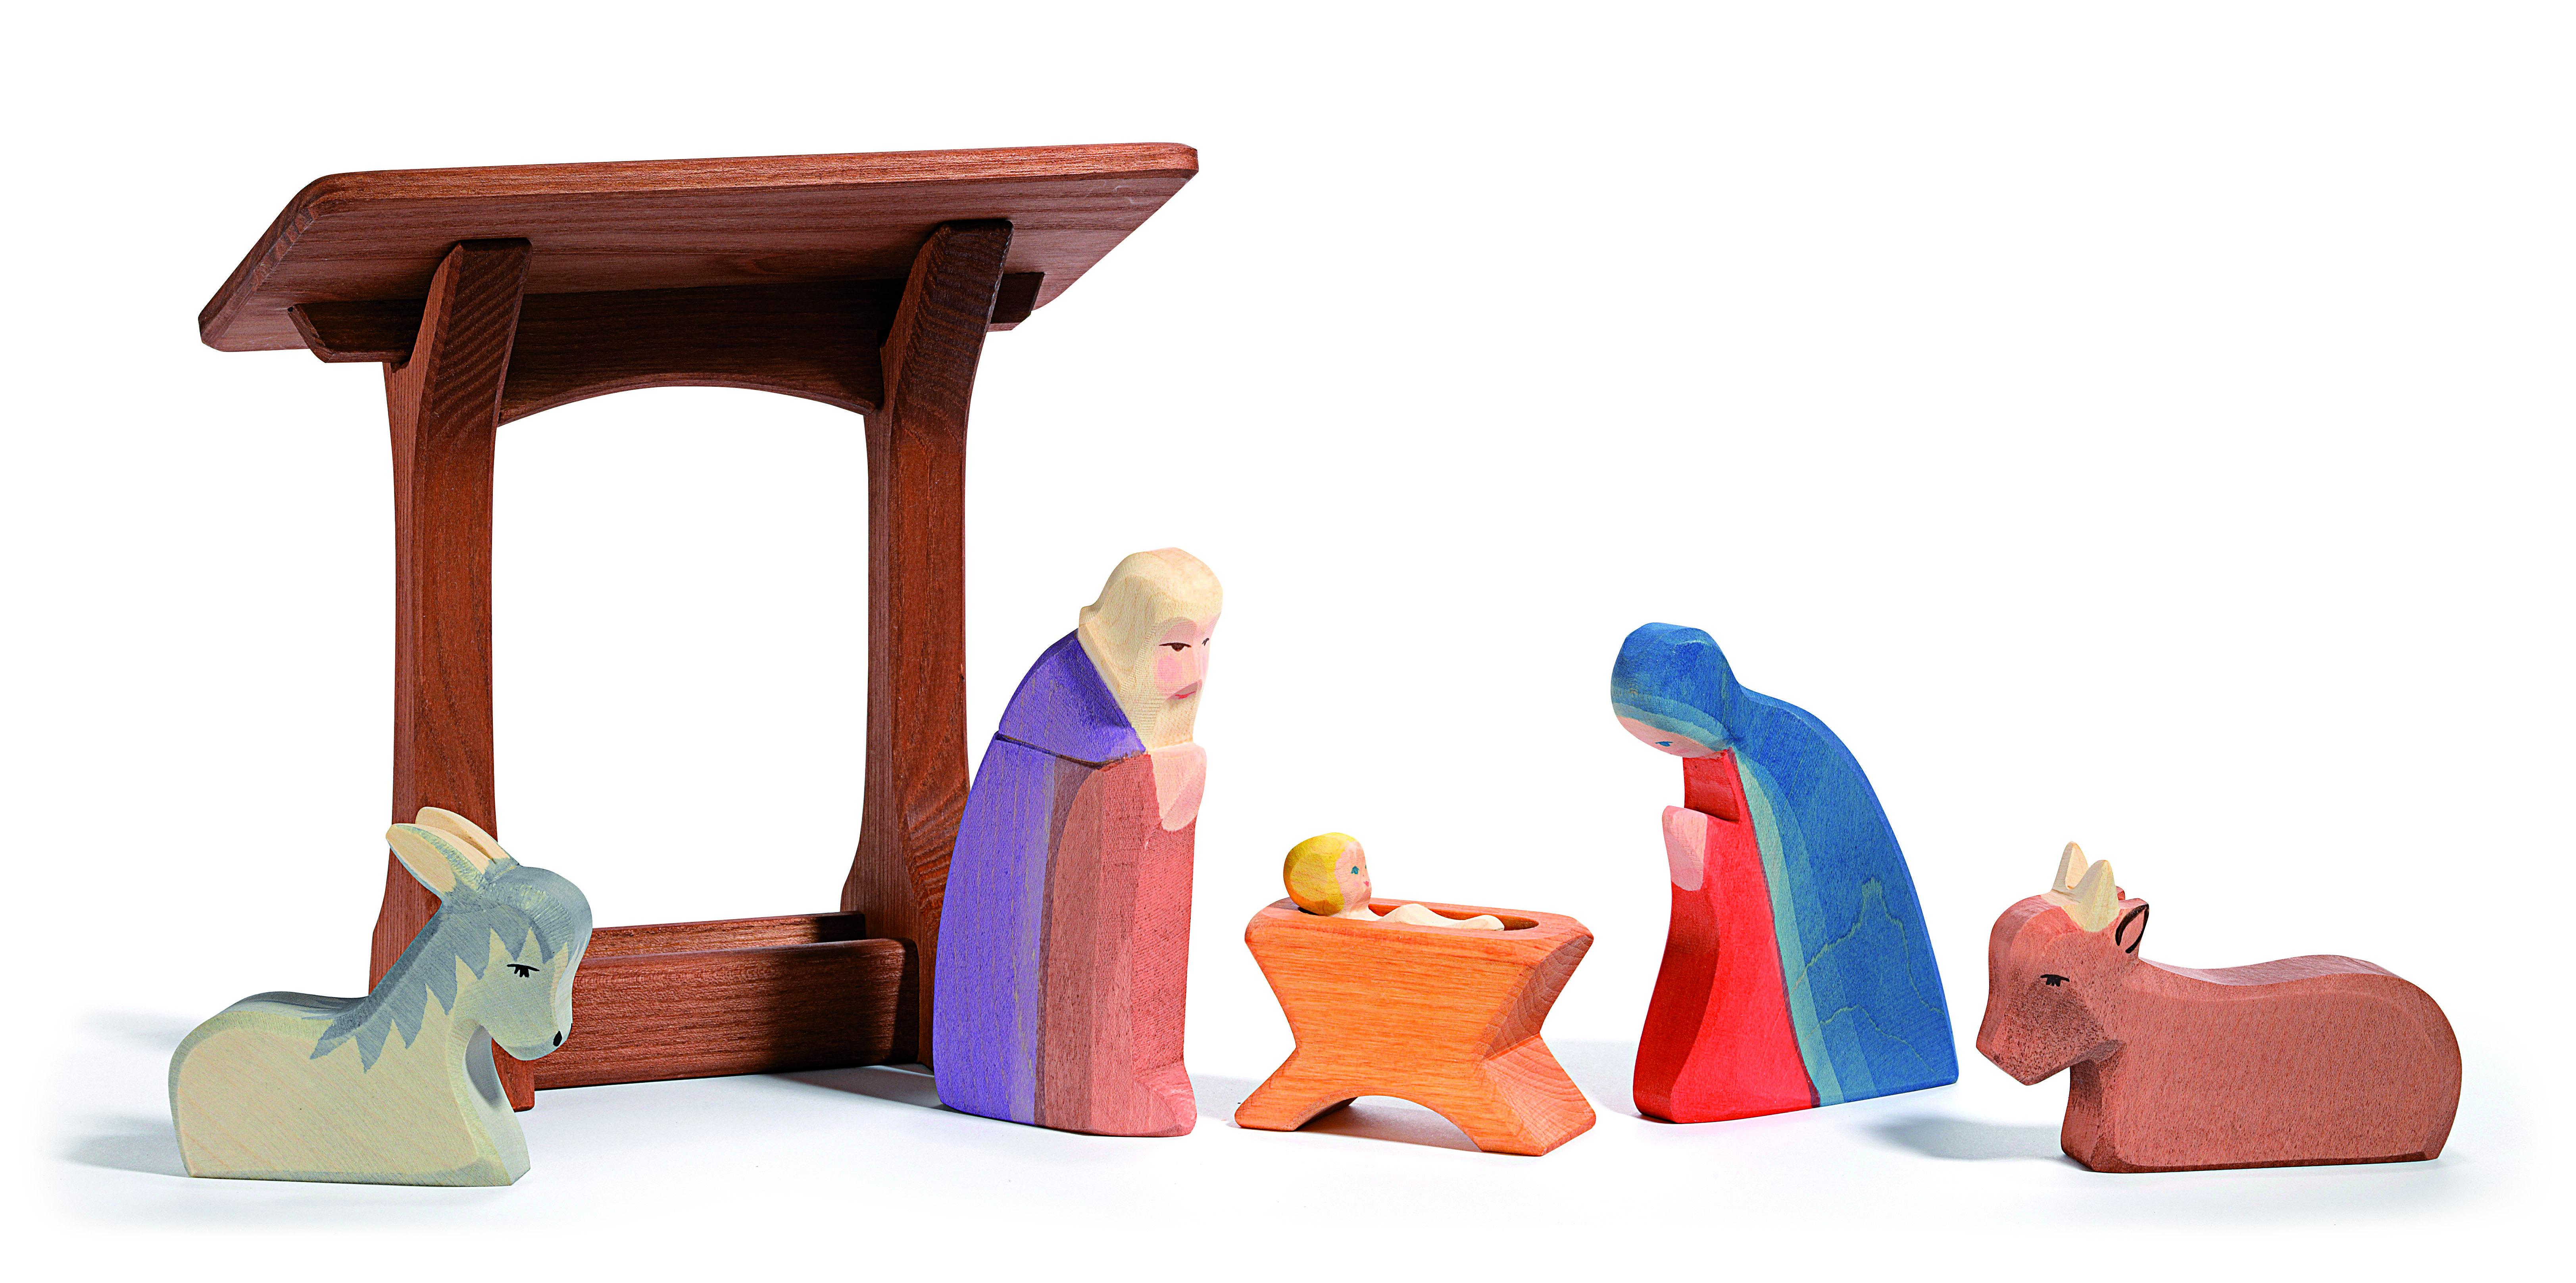 Ostheimer Krippenfiguren Heilige Familie 5 tlg klassisch ohne Stall, Art. 4040